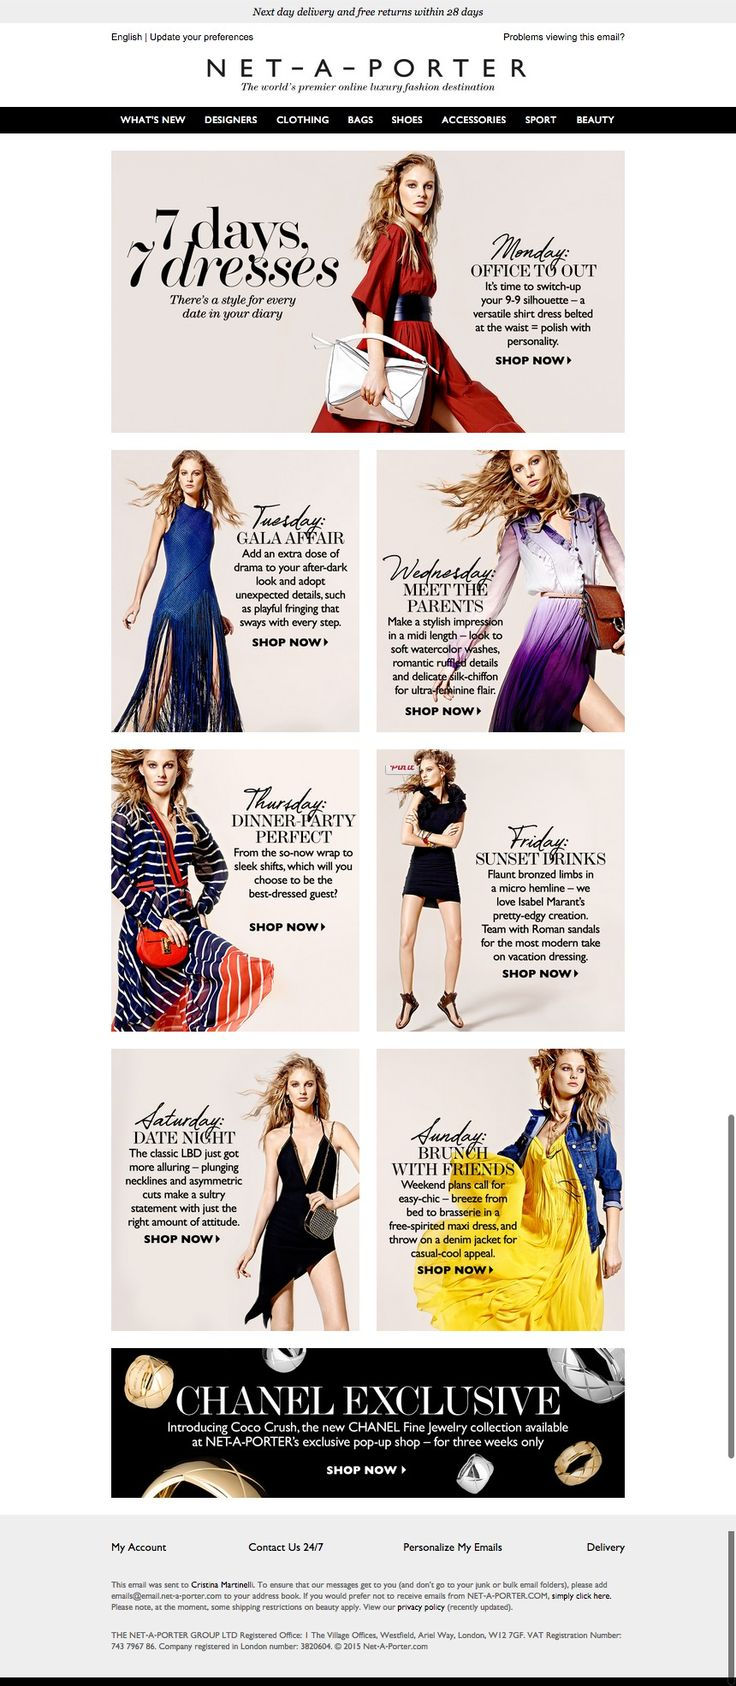 #newsletter Net a porter 04.2015 7 days, 7 dresses